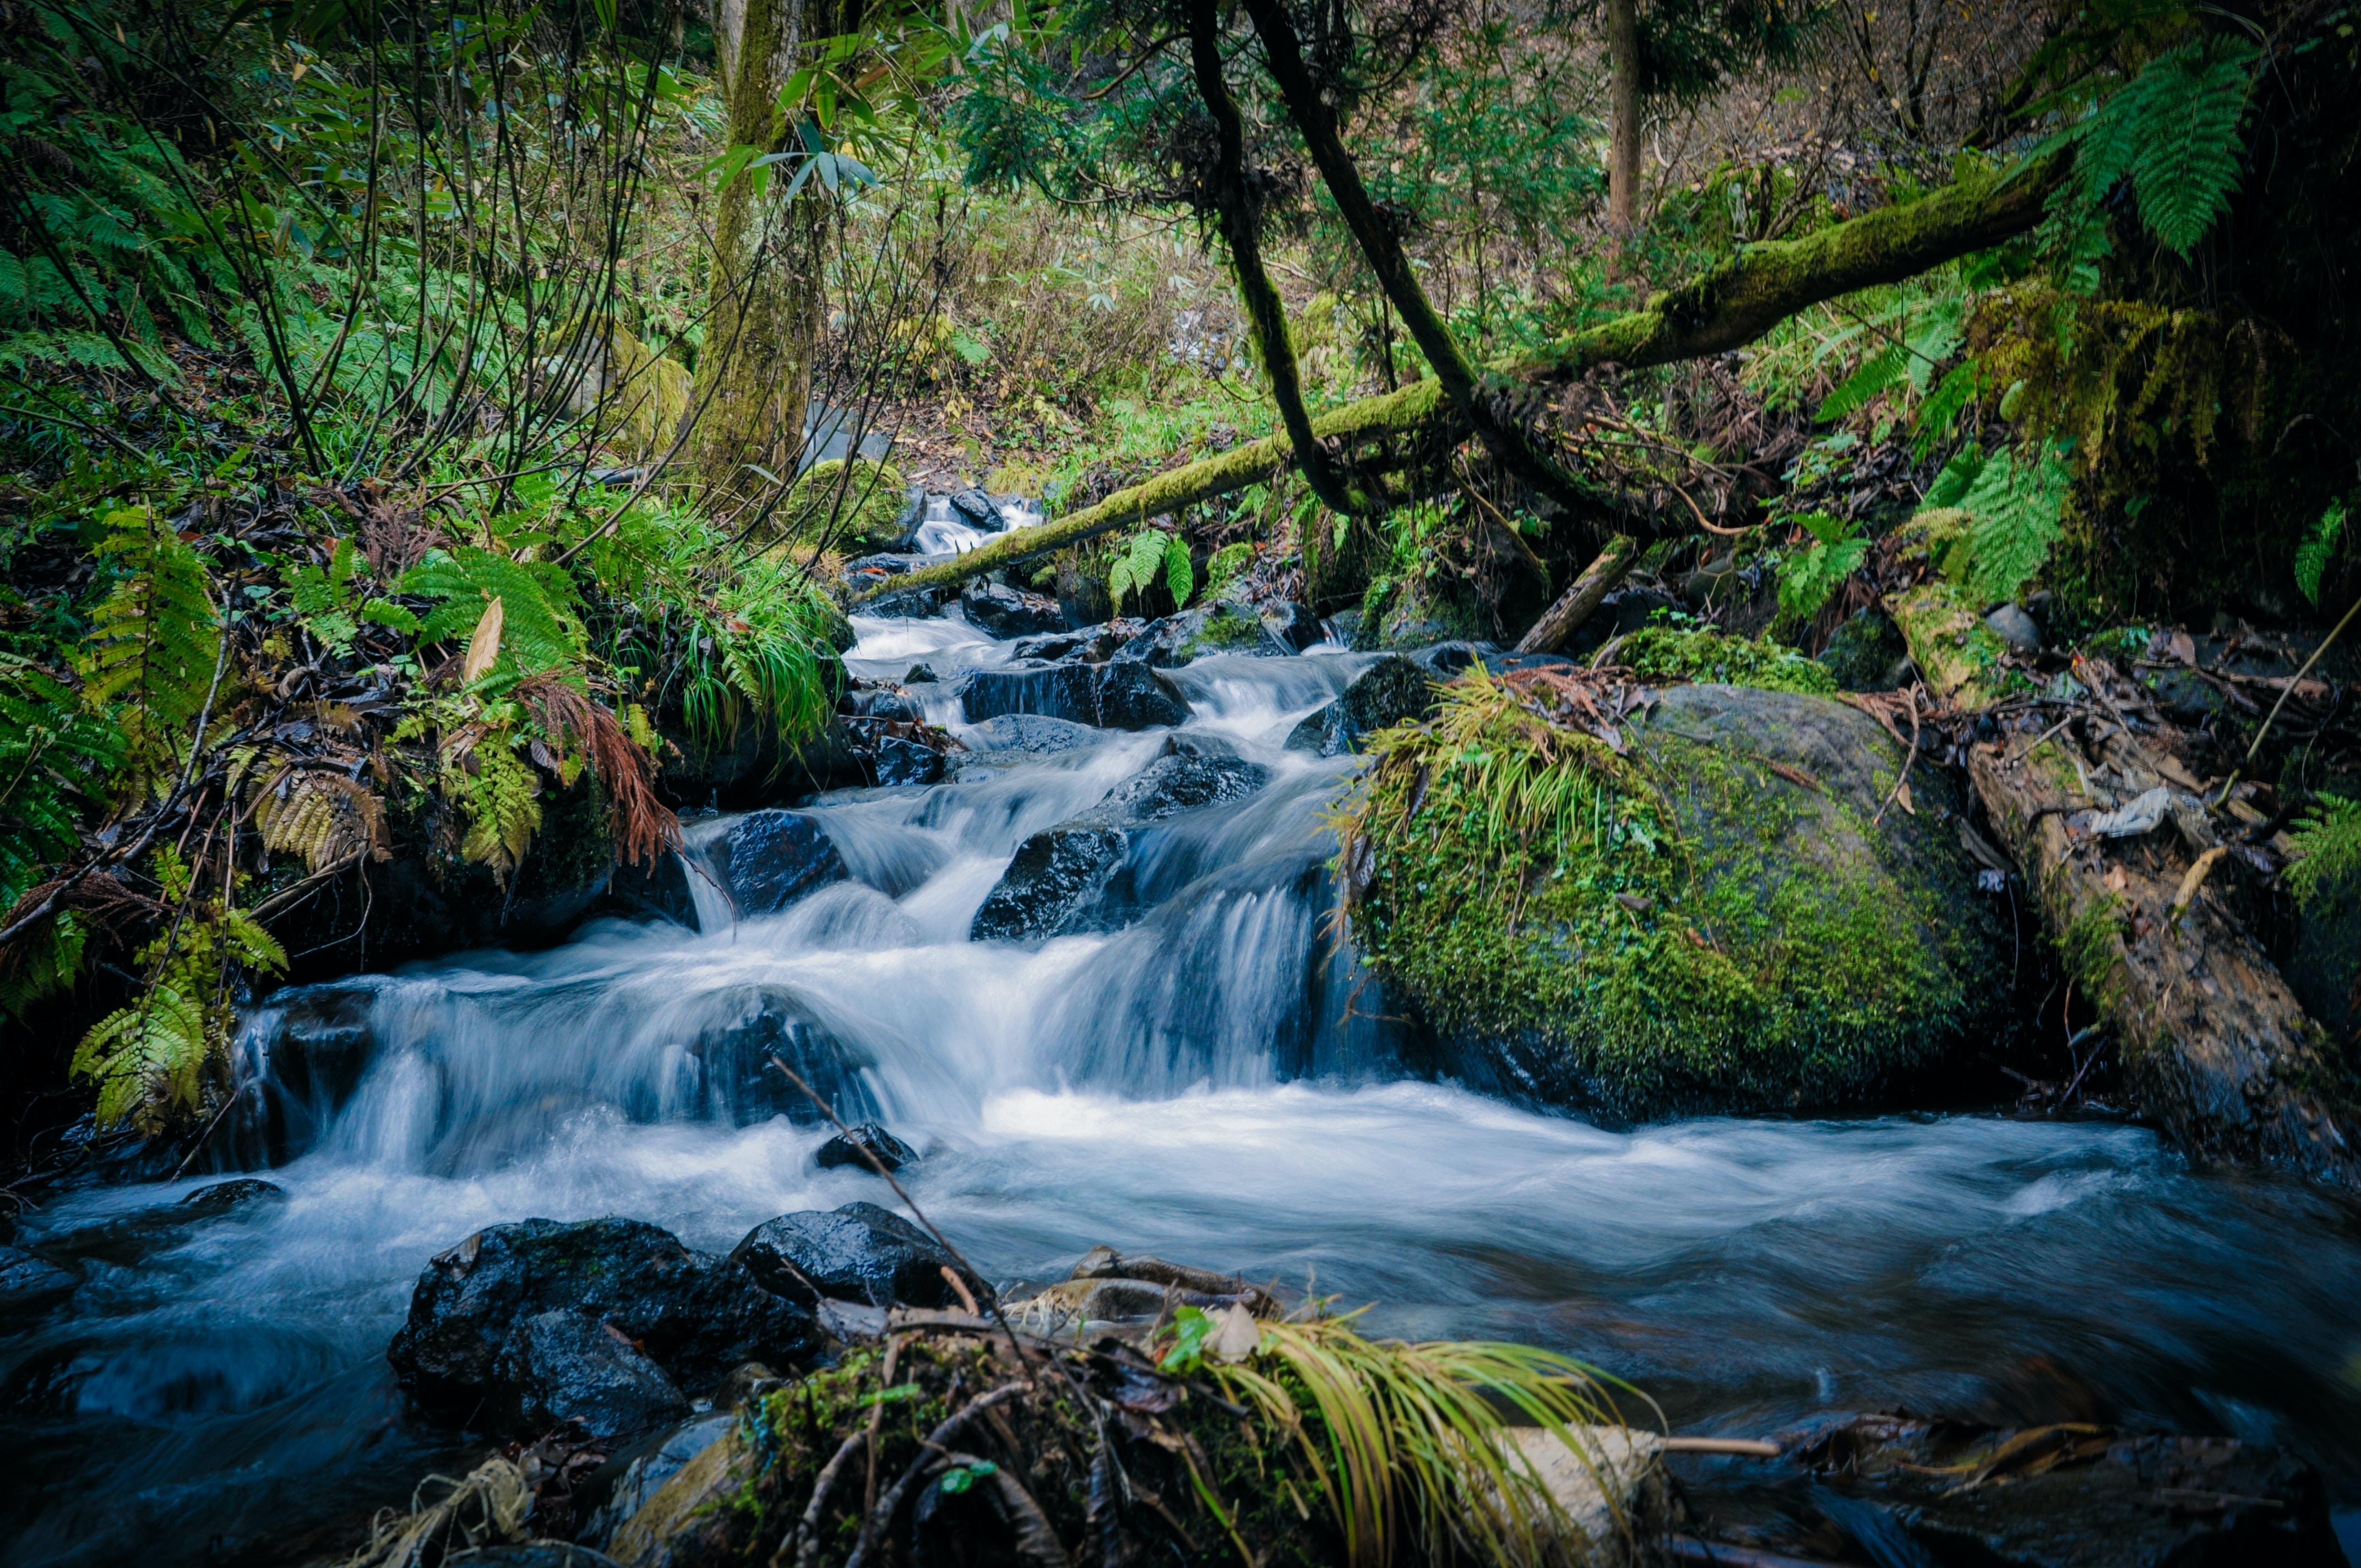 flowing water of river in between of trees